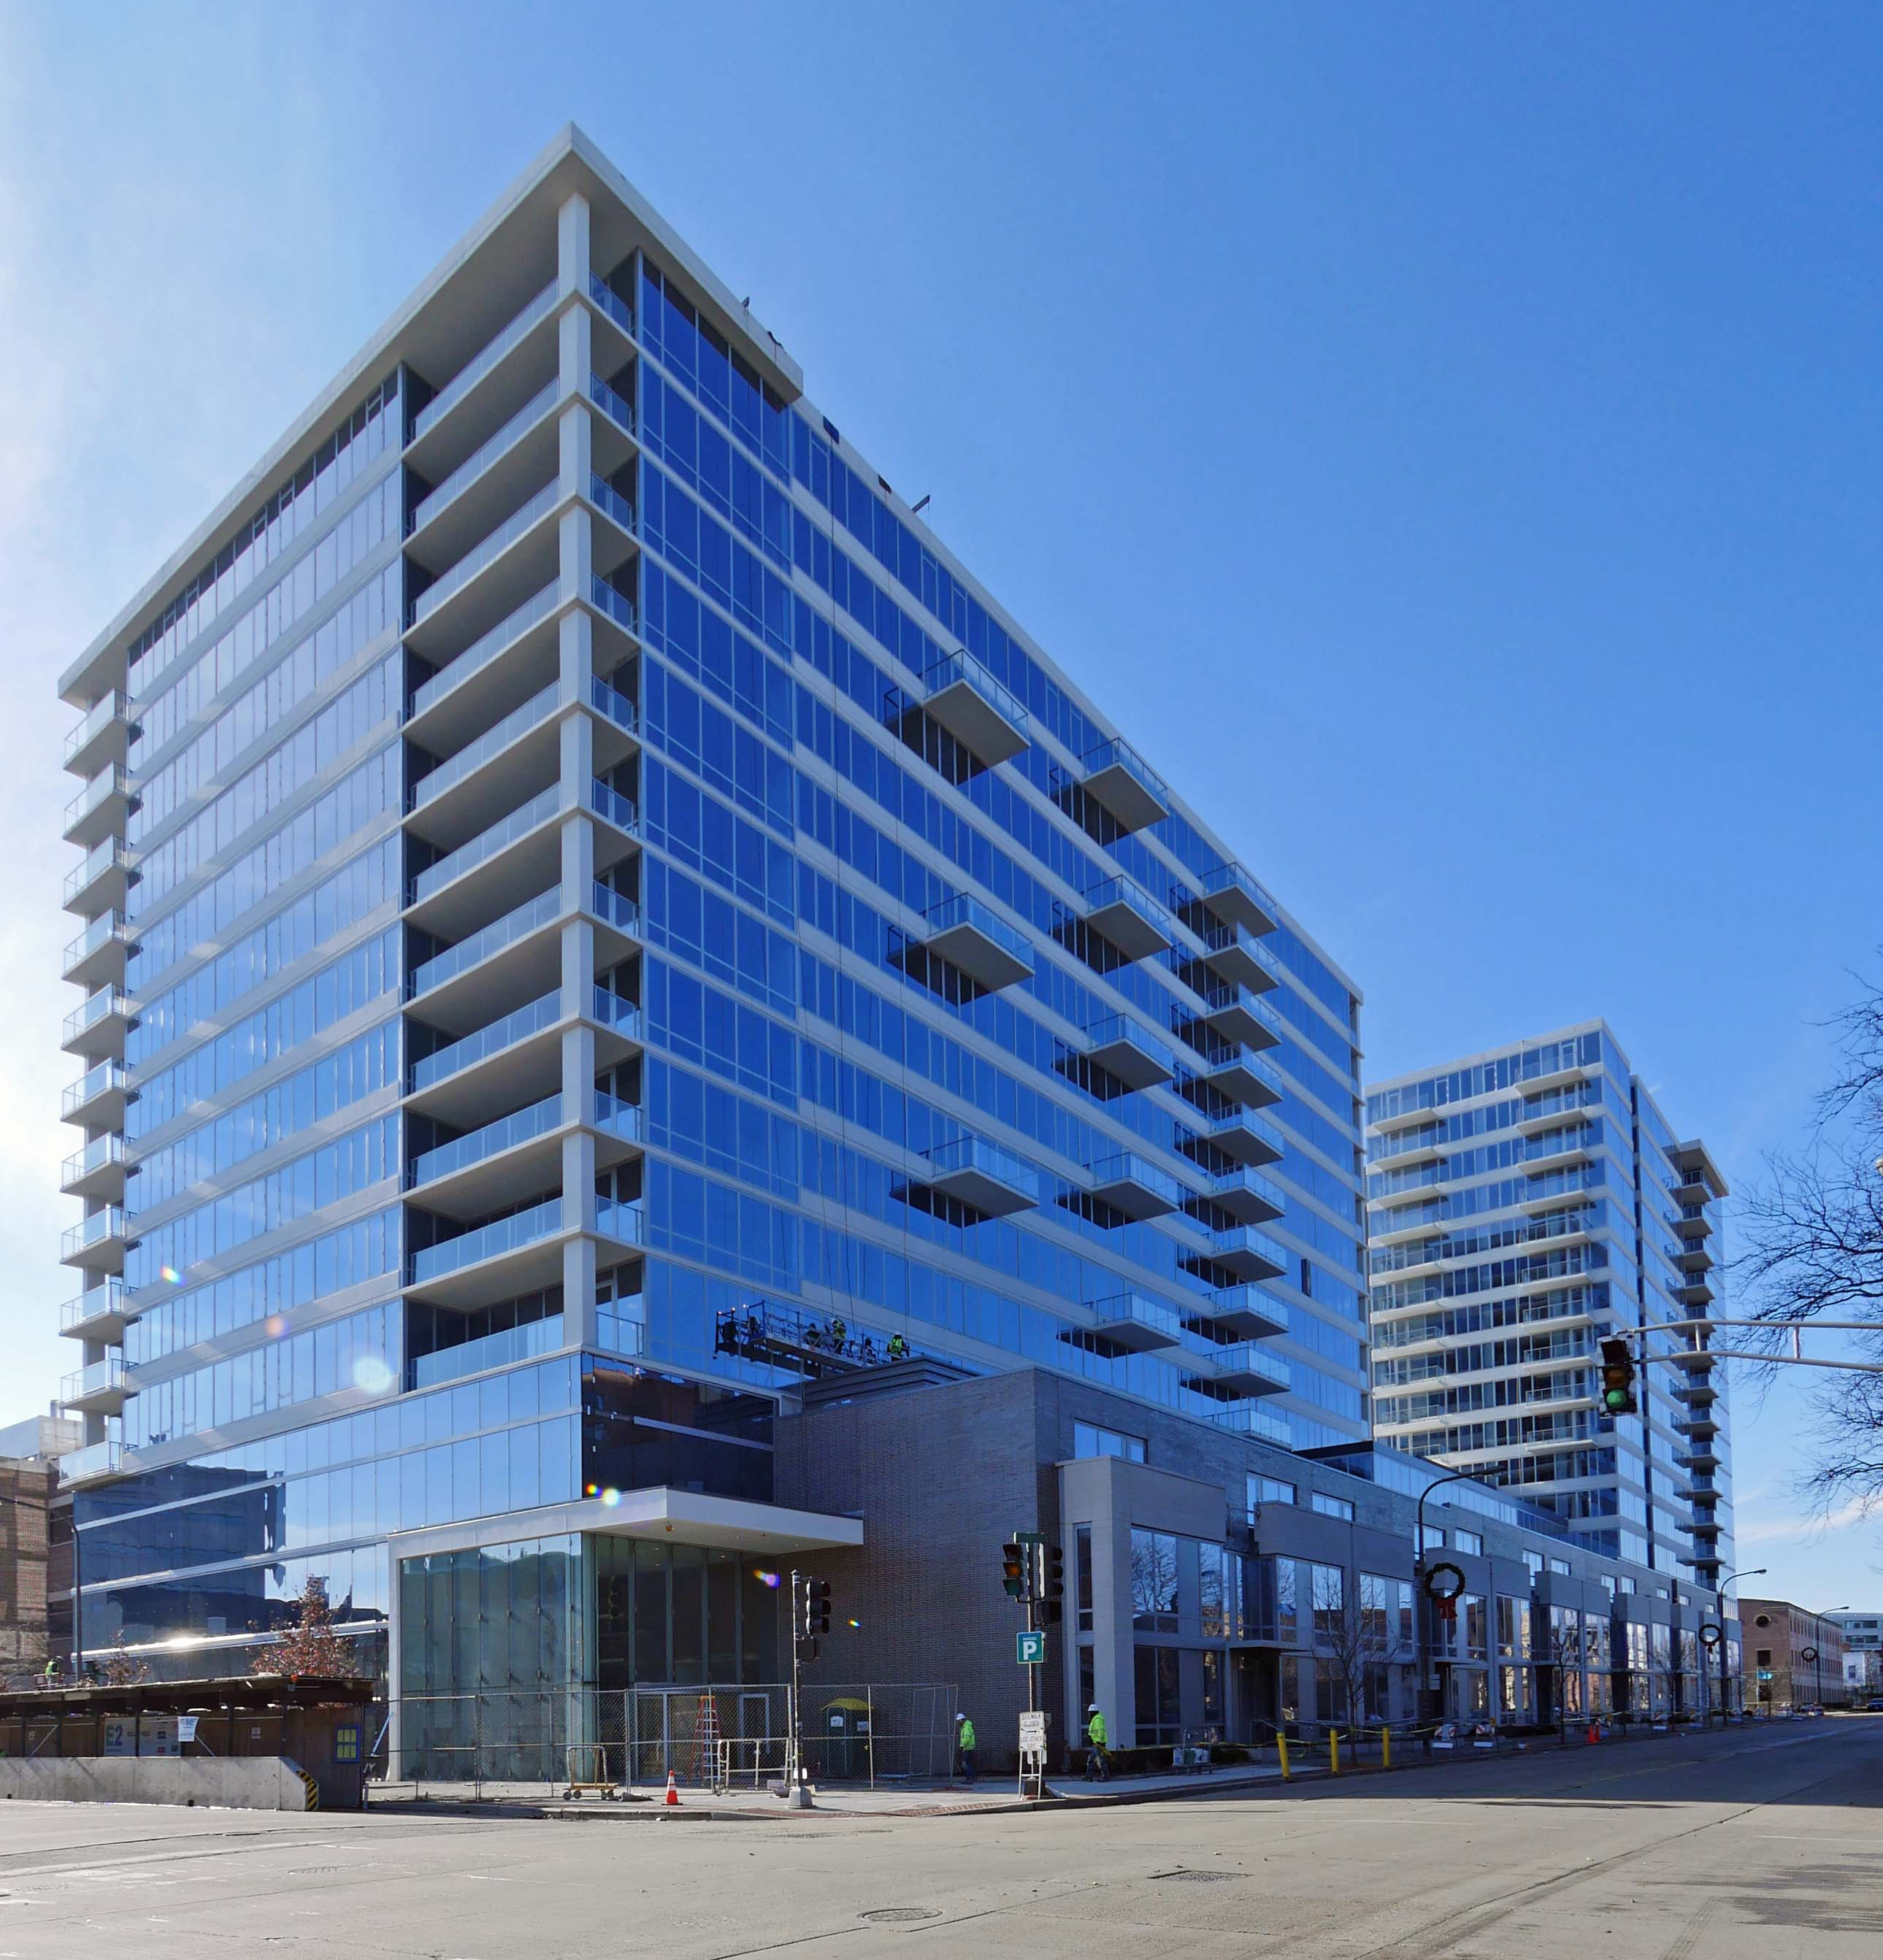 Apartment Reviews: Evanston Apartment Review, E2, 1890 Maple Ave